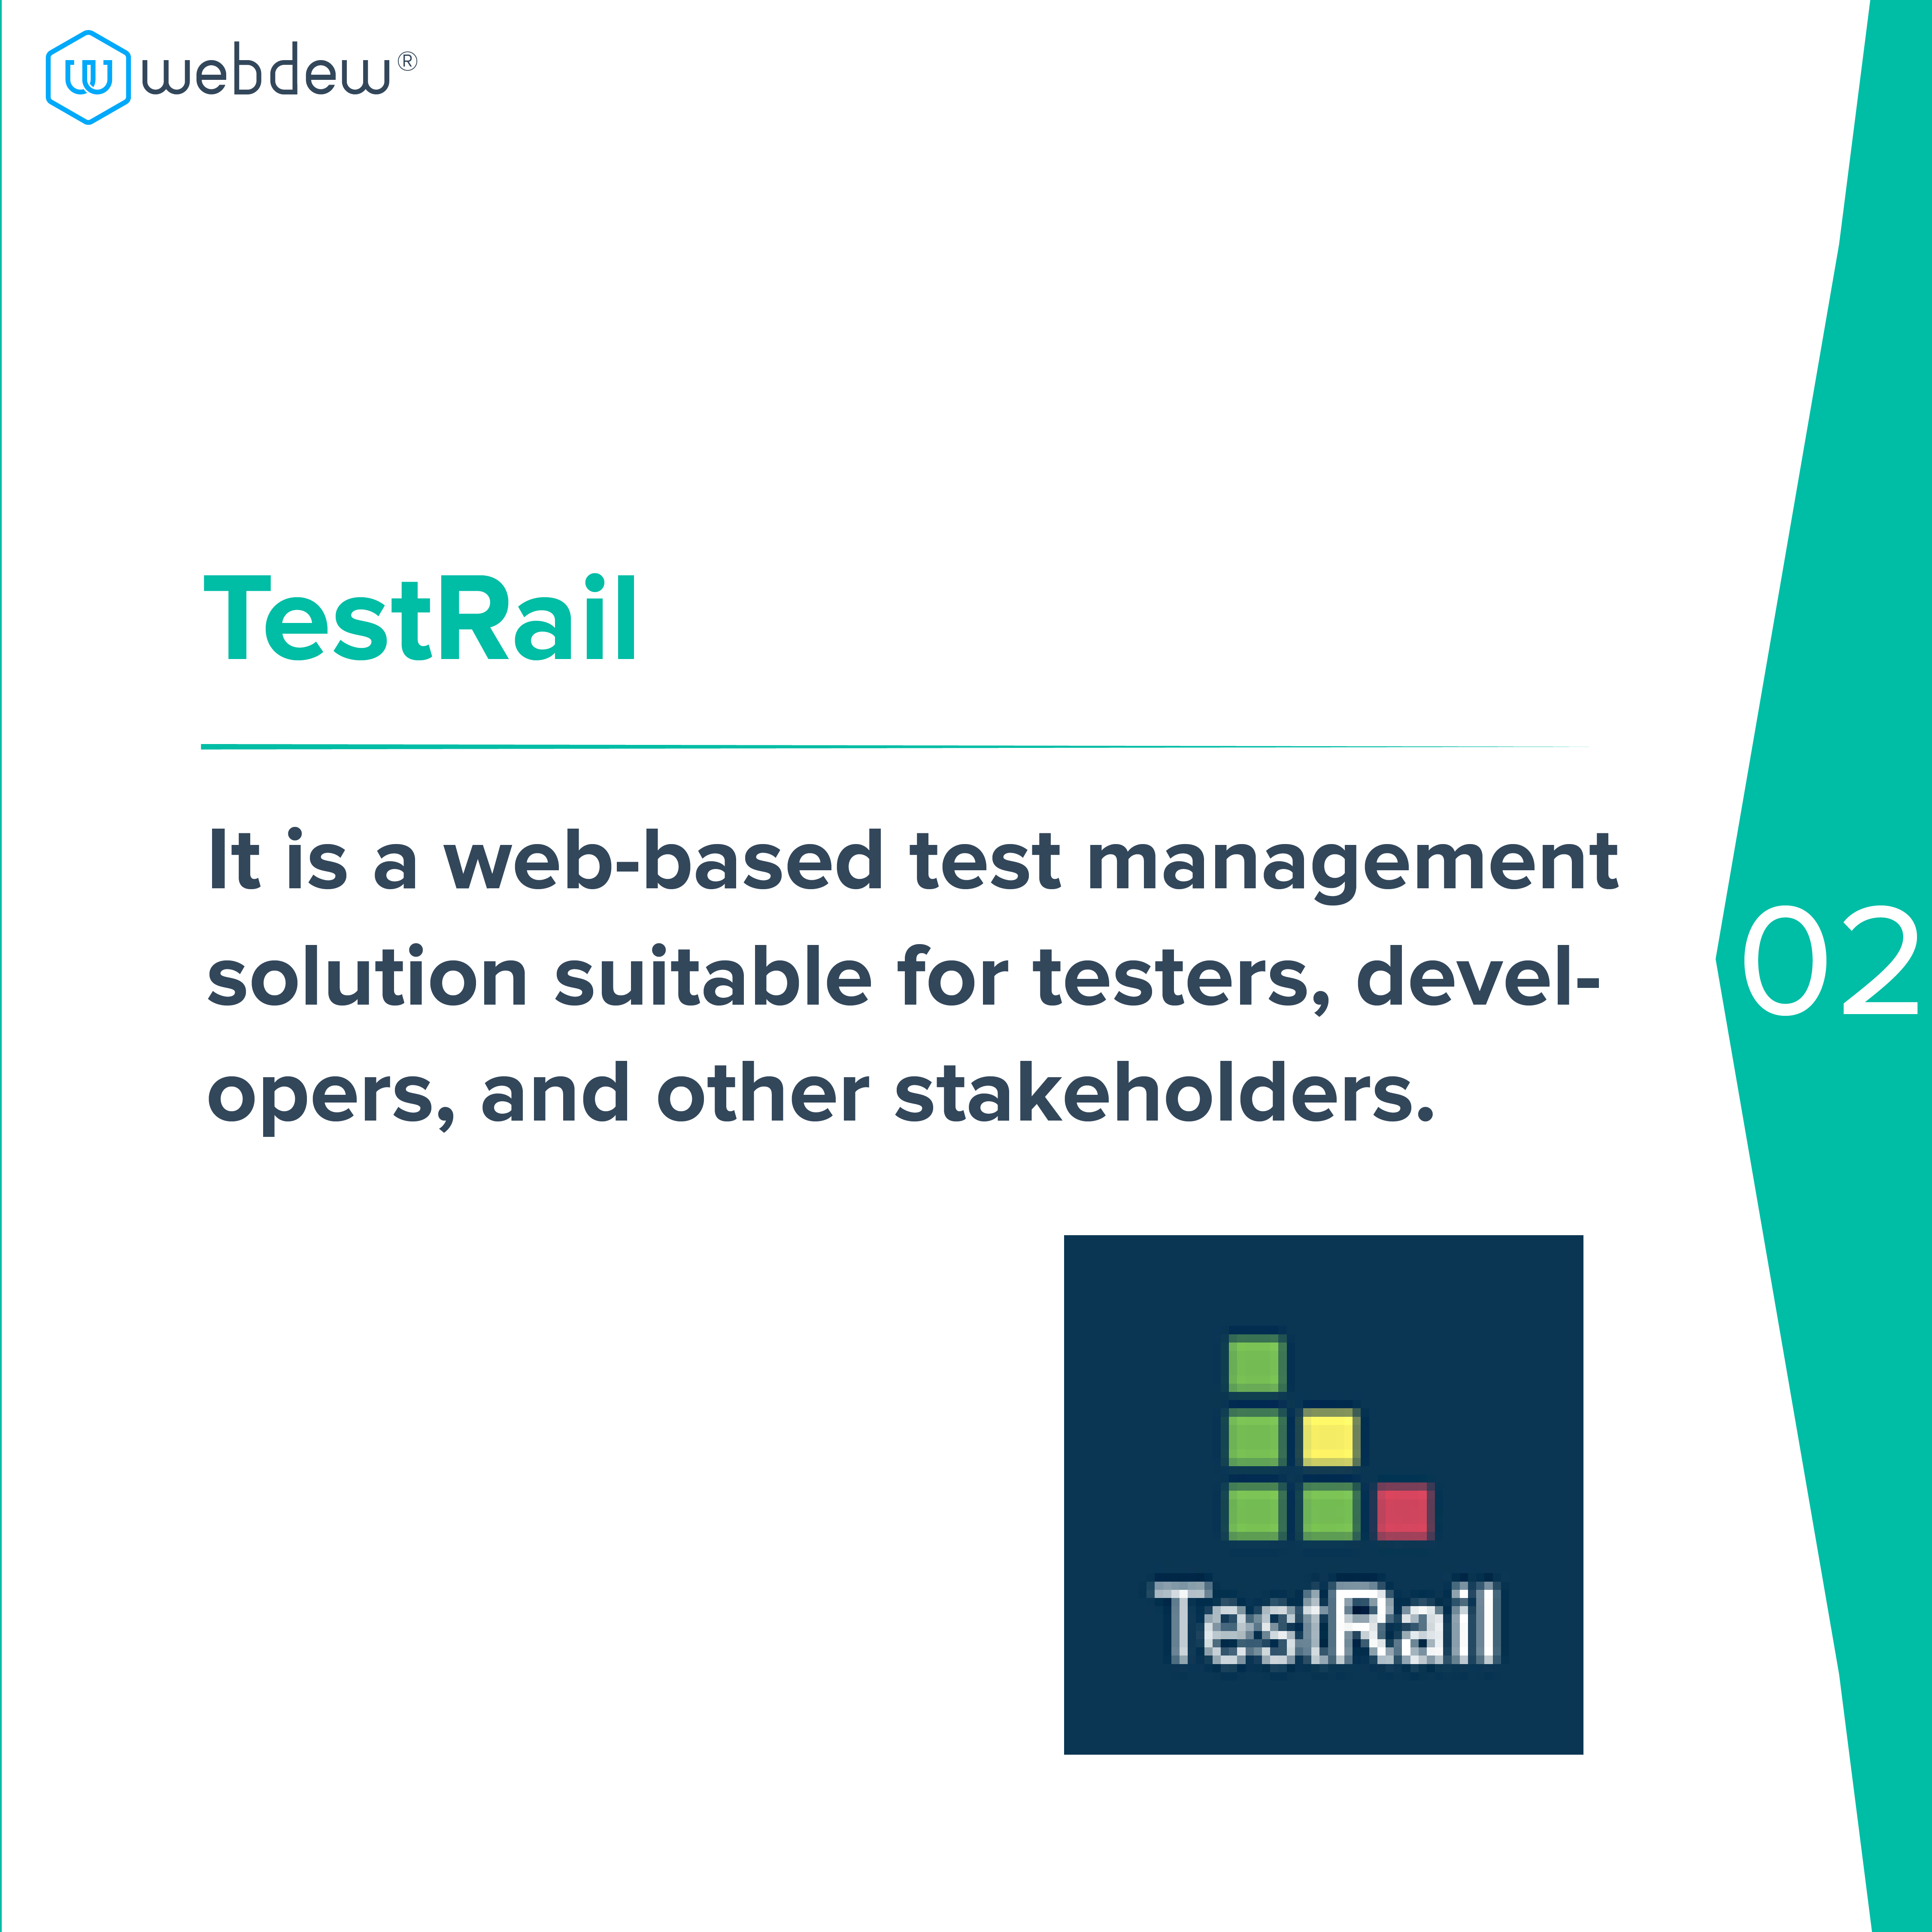 testrail-web-development-tool